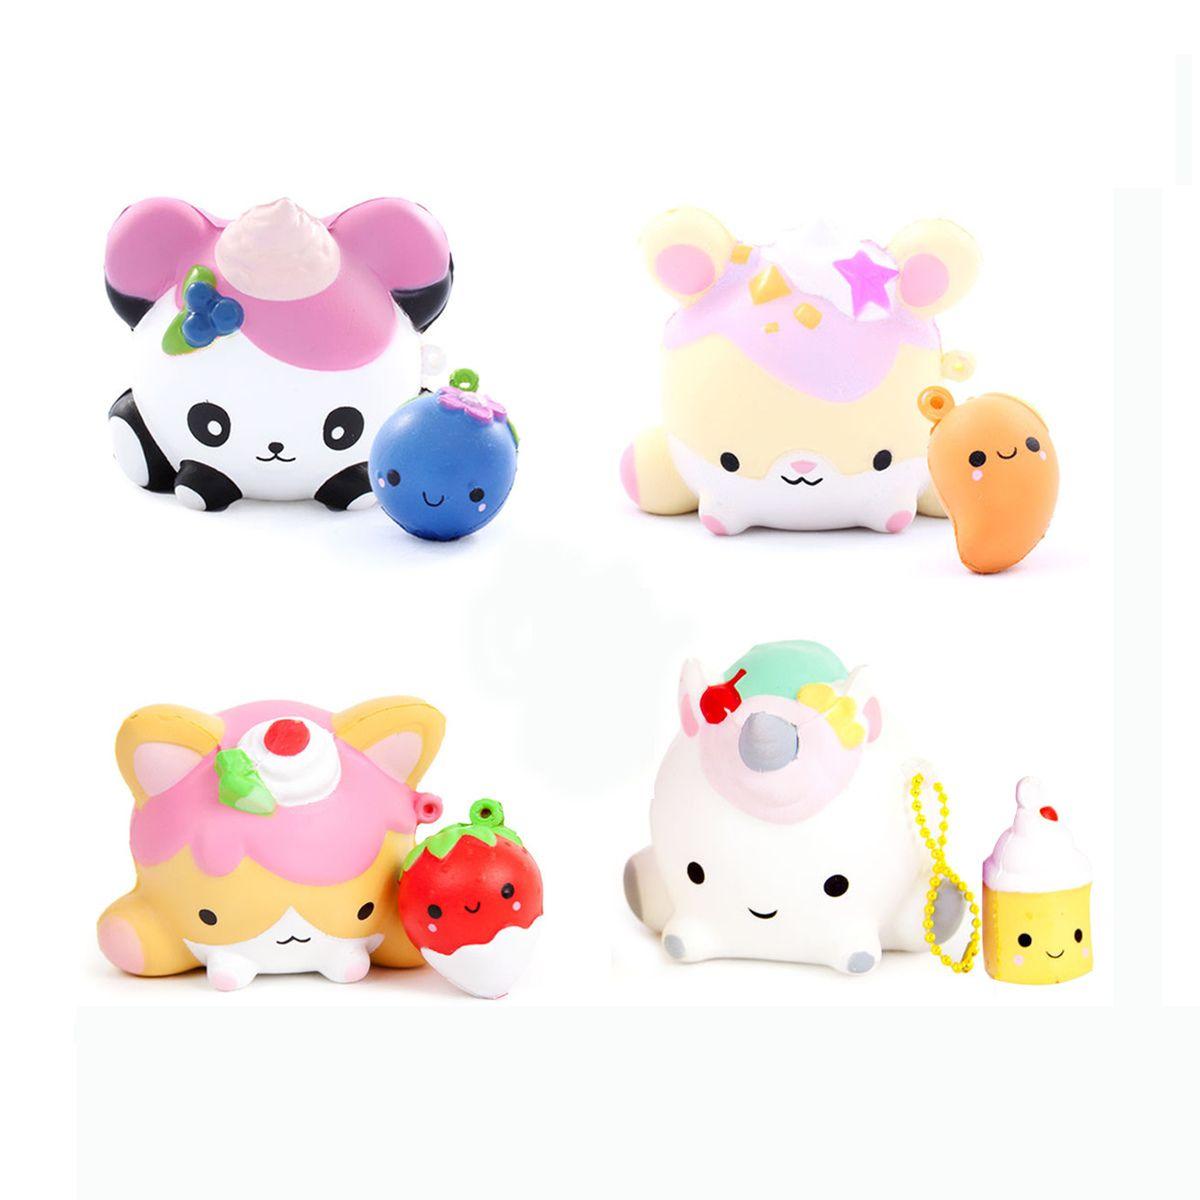 Smooshy Mushy Pet Assorted Kmart Squishies Cute Squishies Cool Toys